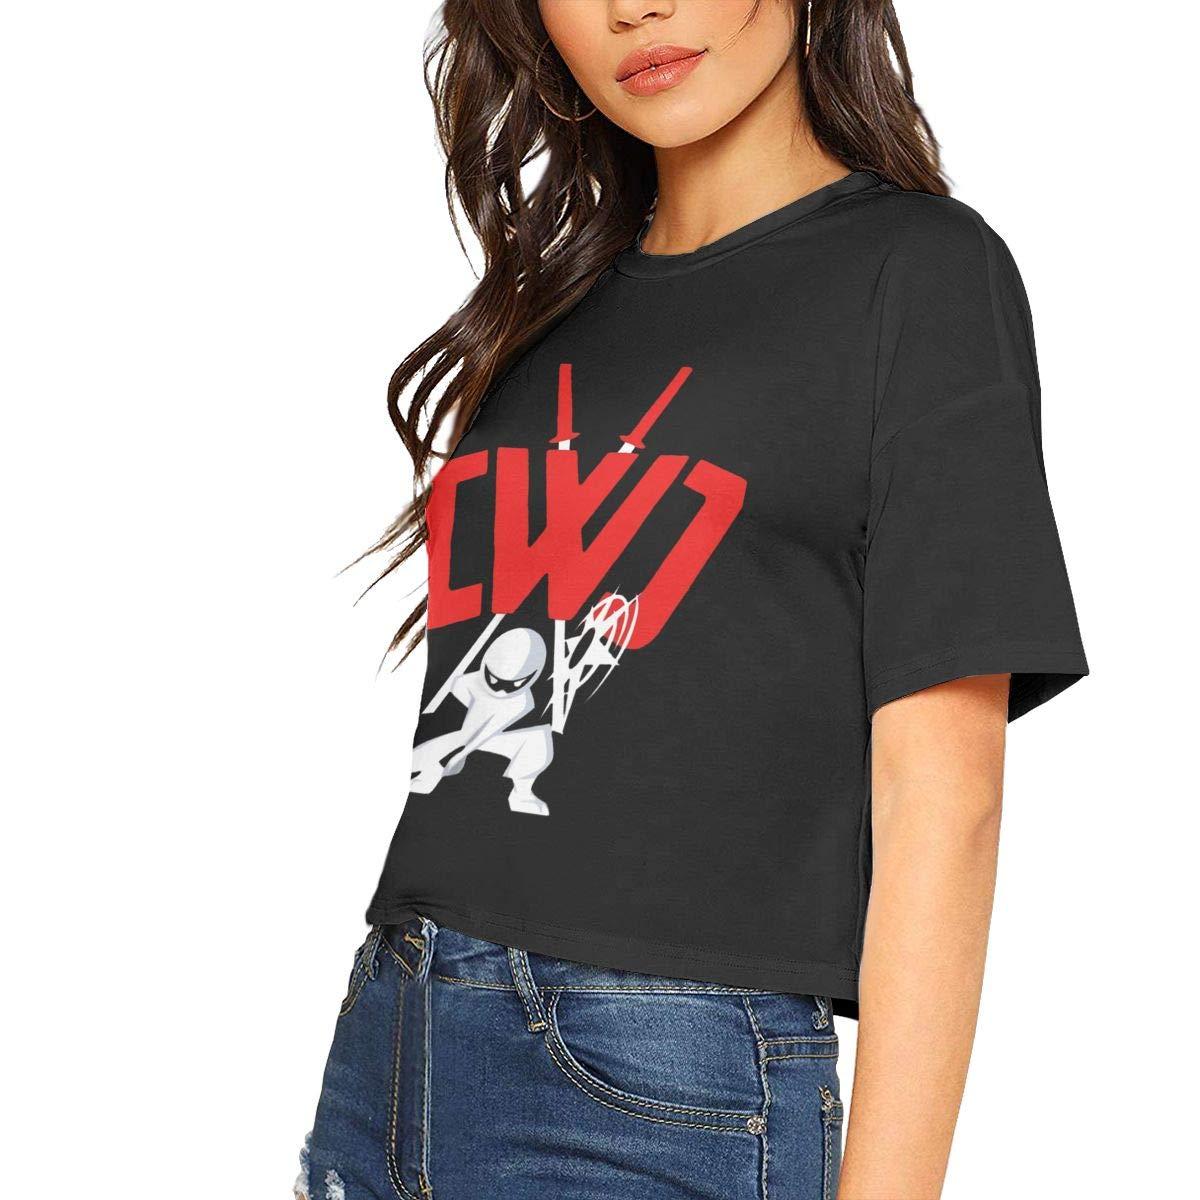 CWC Chad Wild Clay Ninja Woman Soft Leak Navel T Shirt at ...